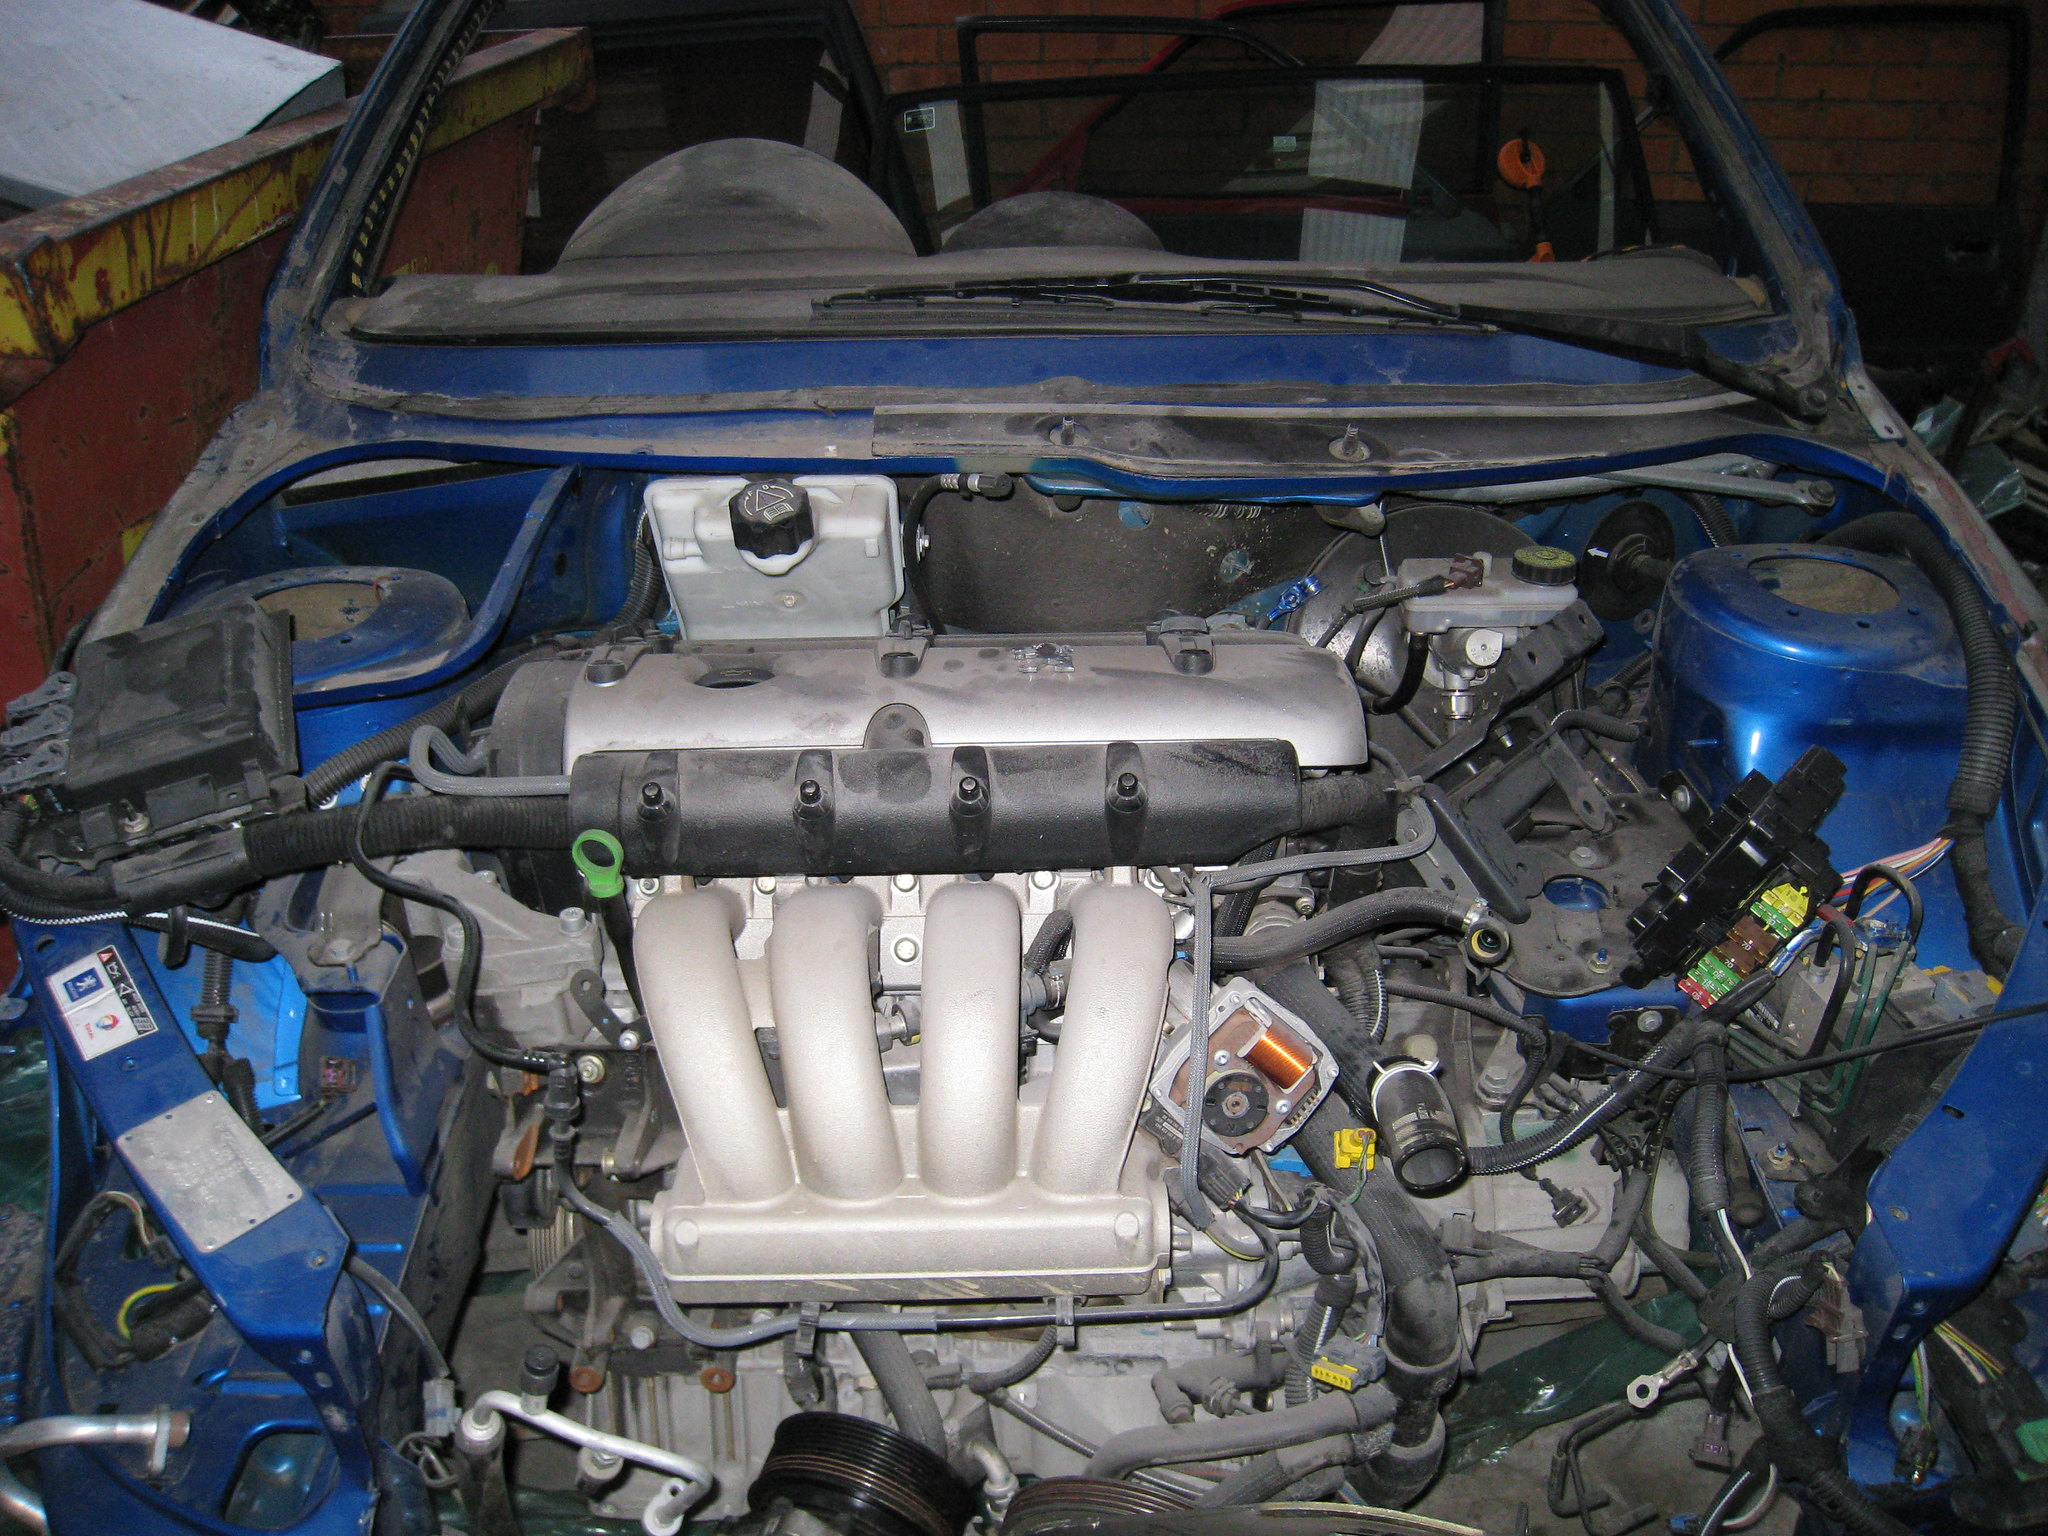 Peugeot 206 Gti 180 Wiring Diagram : Engine immobilizer fault peugeot — Идеи изображения